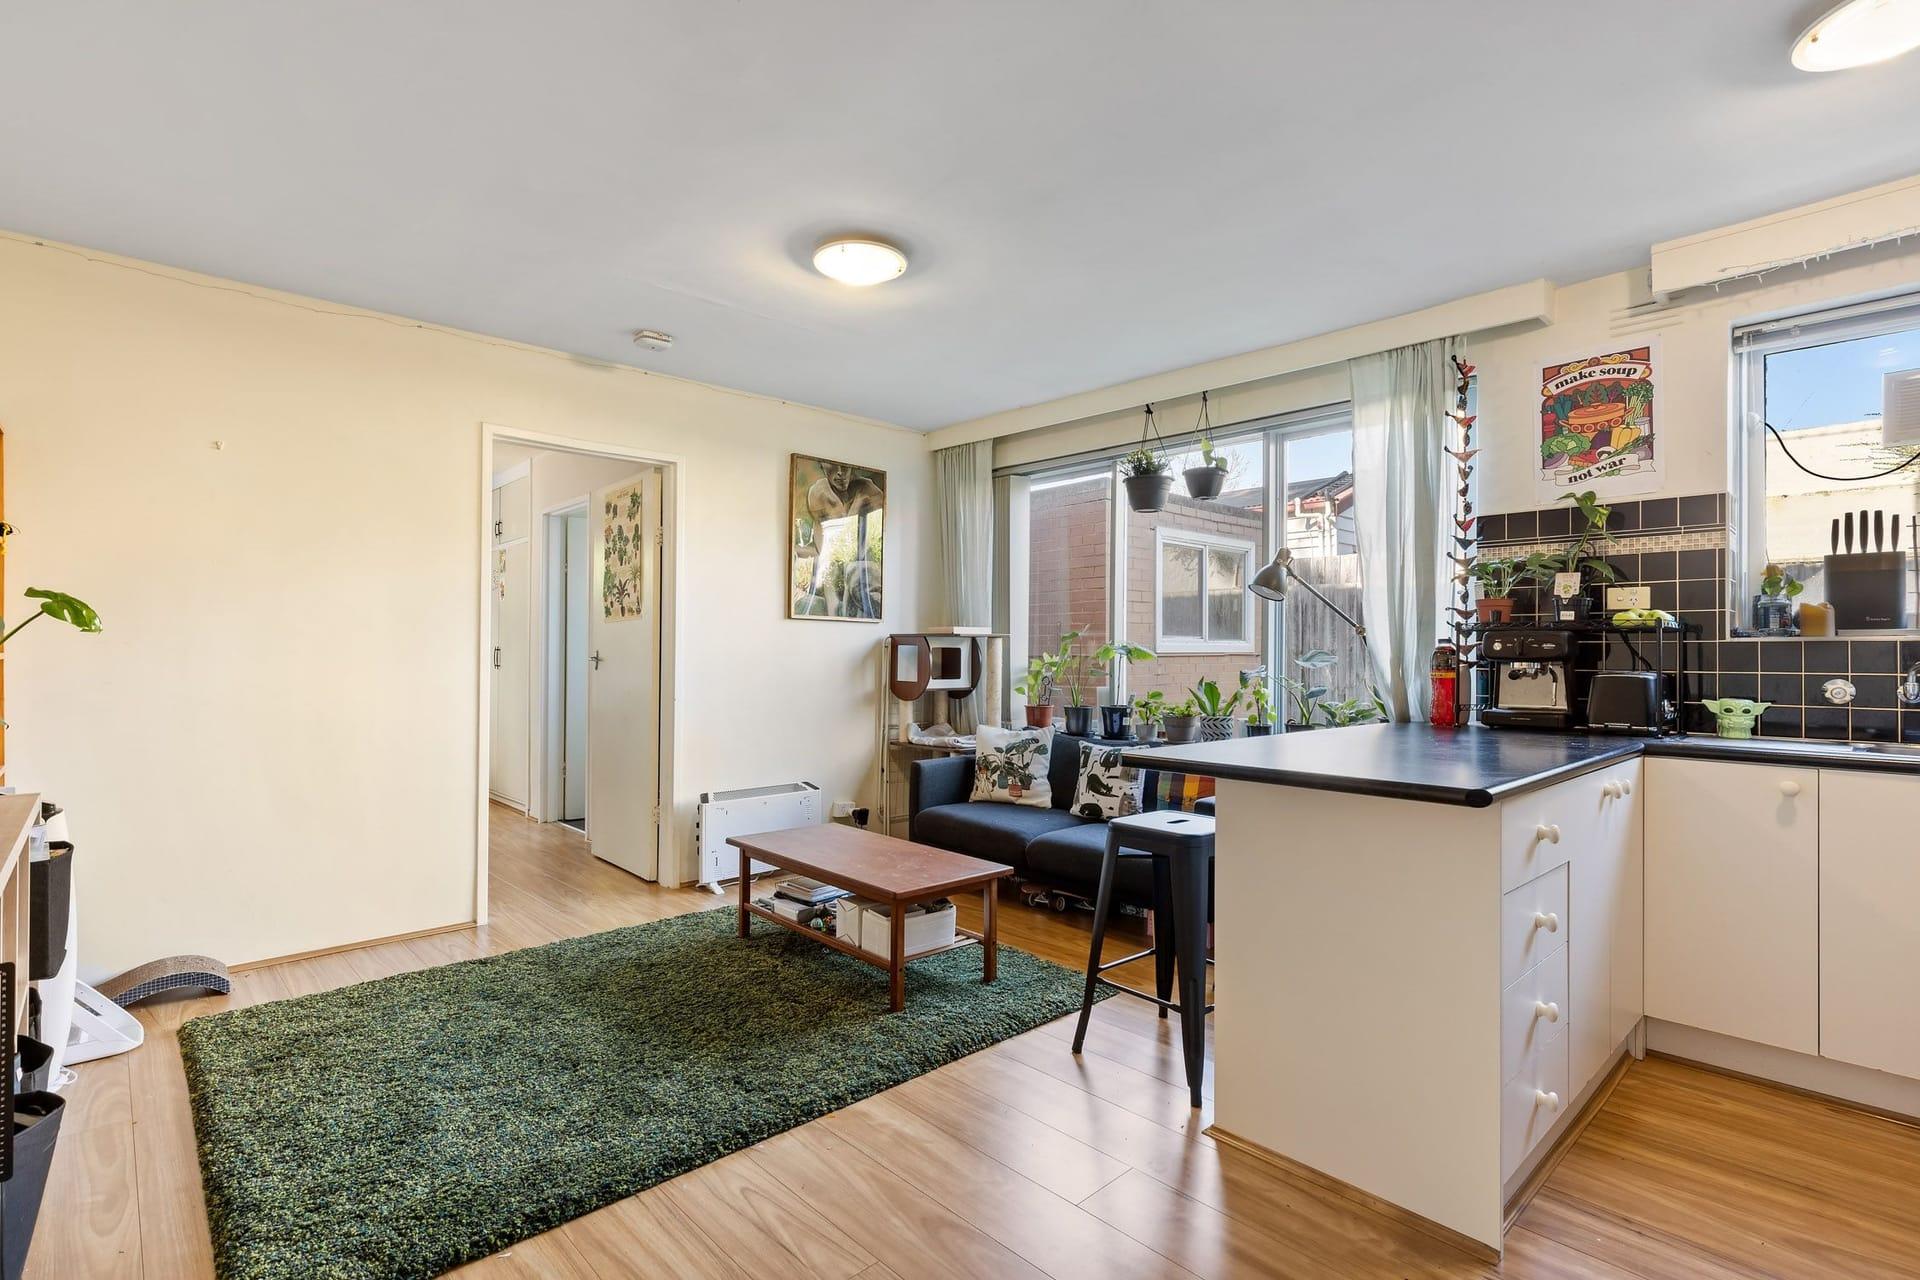 Property 10, 8-10 Clyde Street, MARIBYRNONG VIC 3032 IMAGE